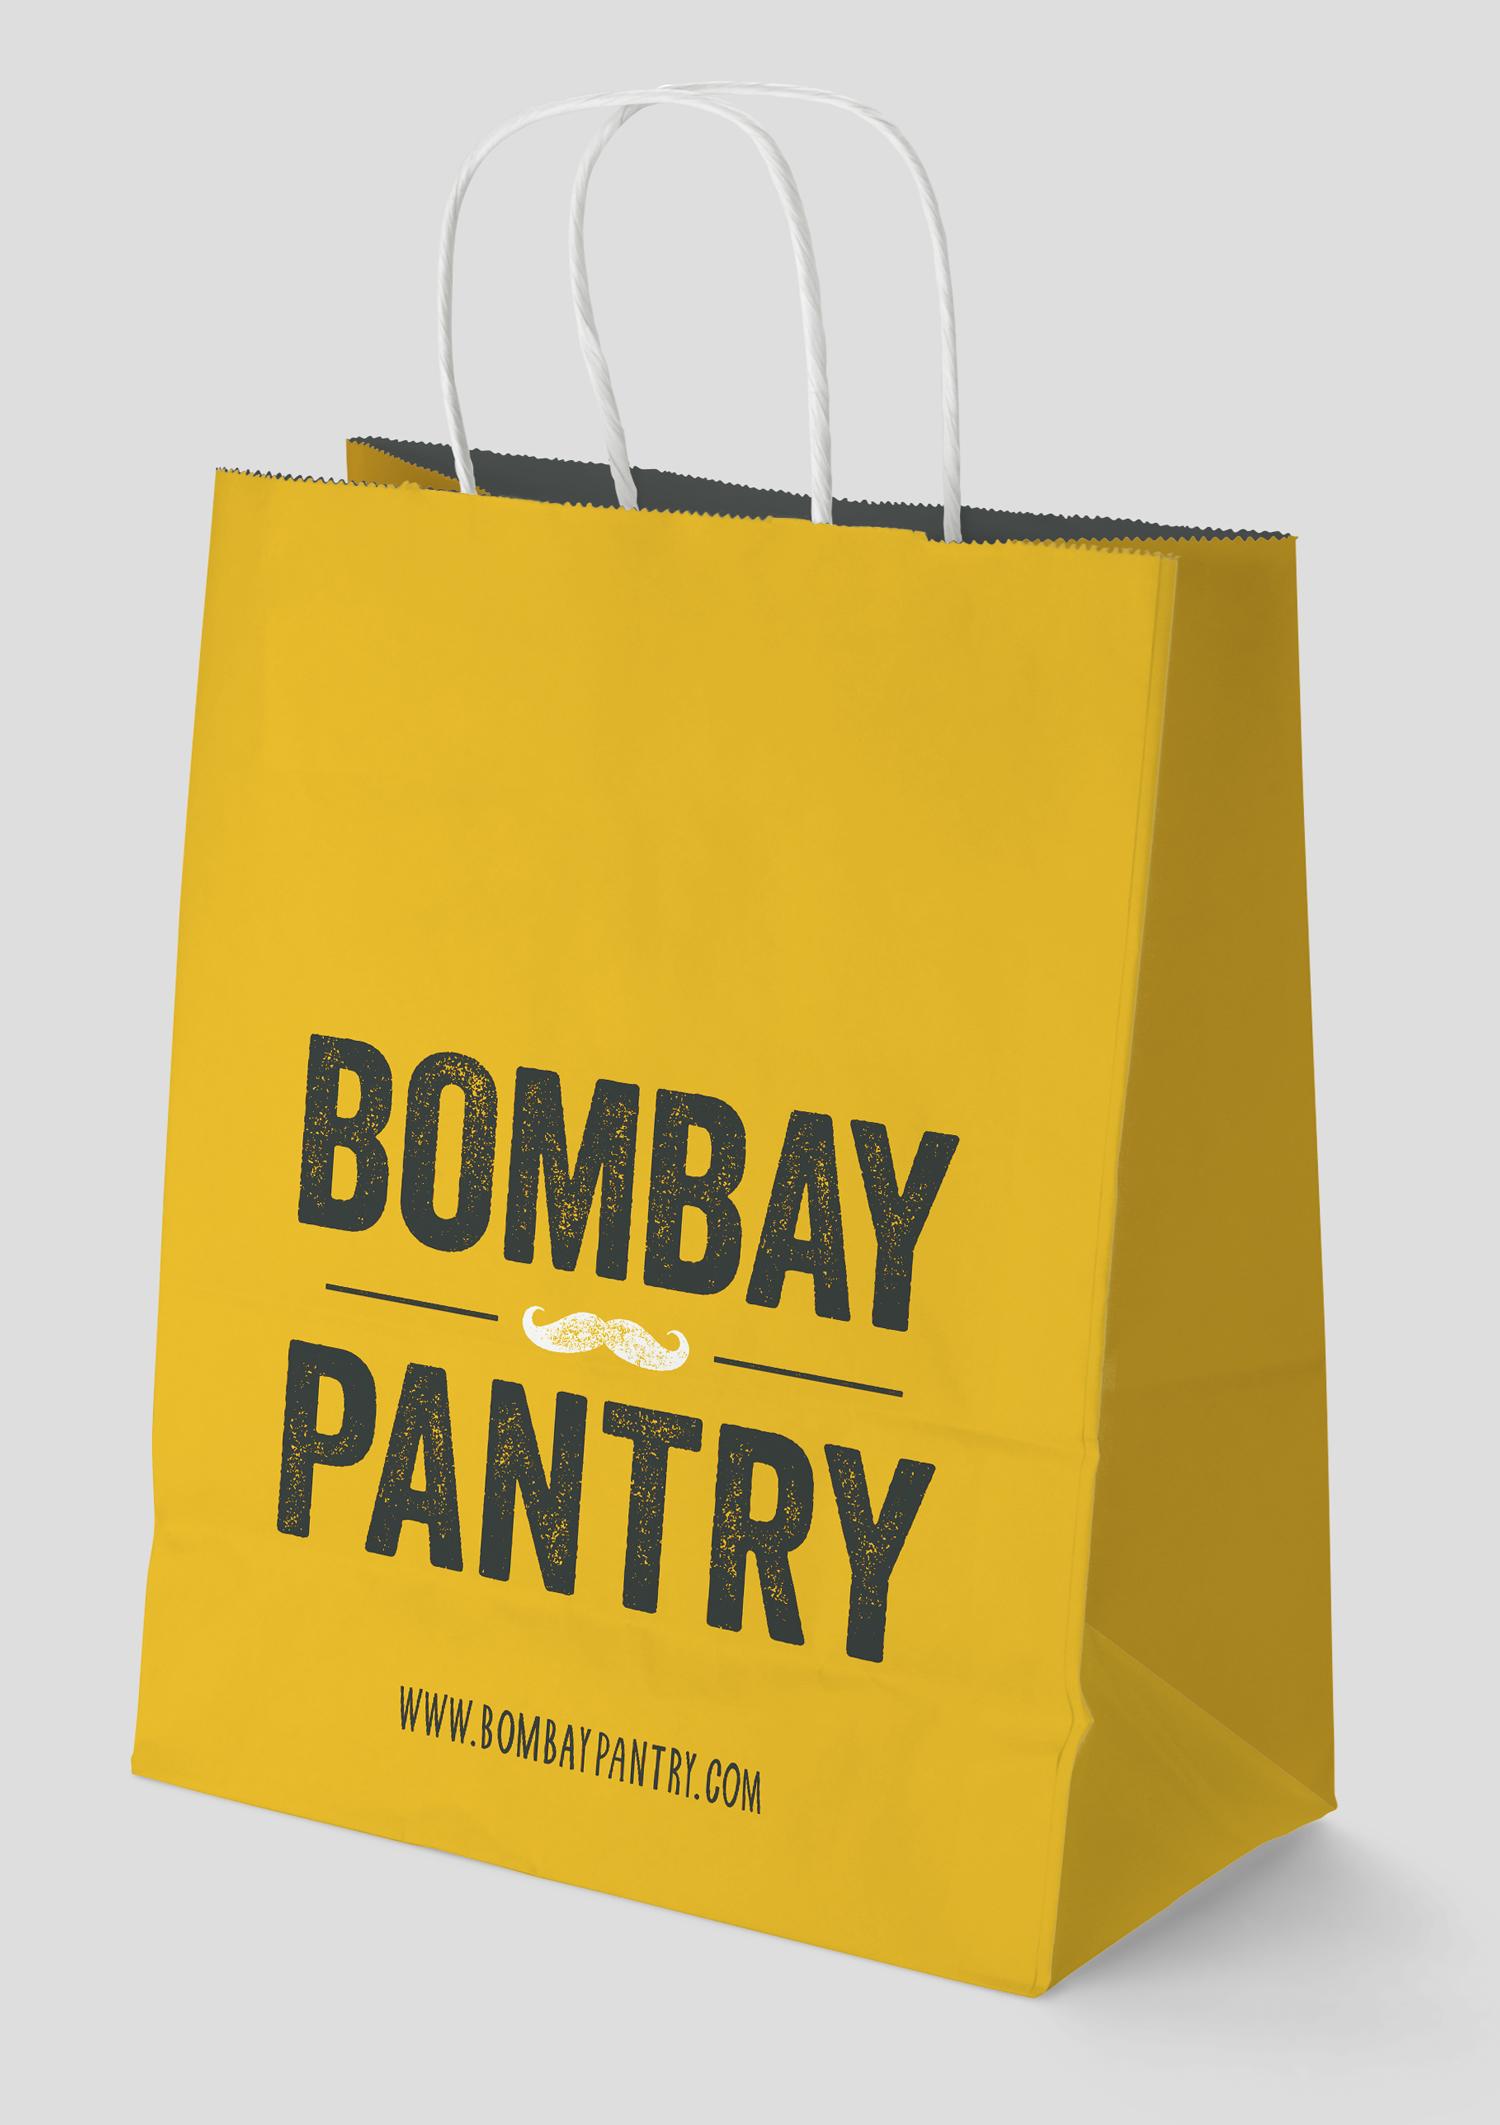 Bombay_Pantry_Stephen_Kiernan_bag.jpg